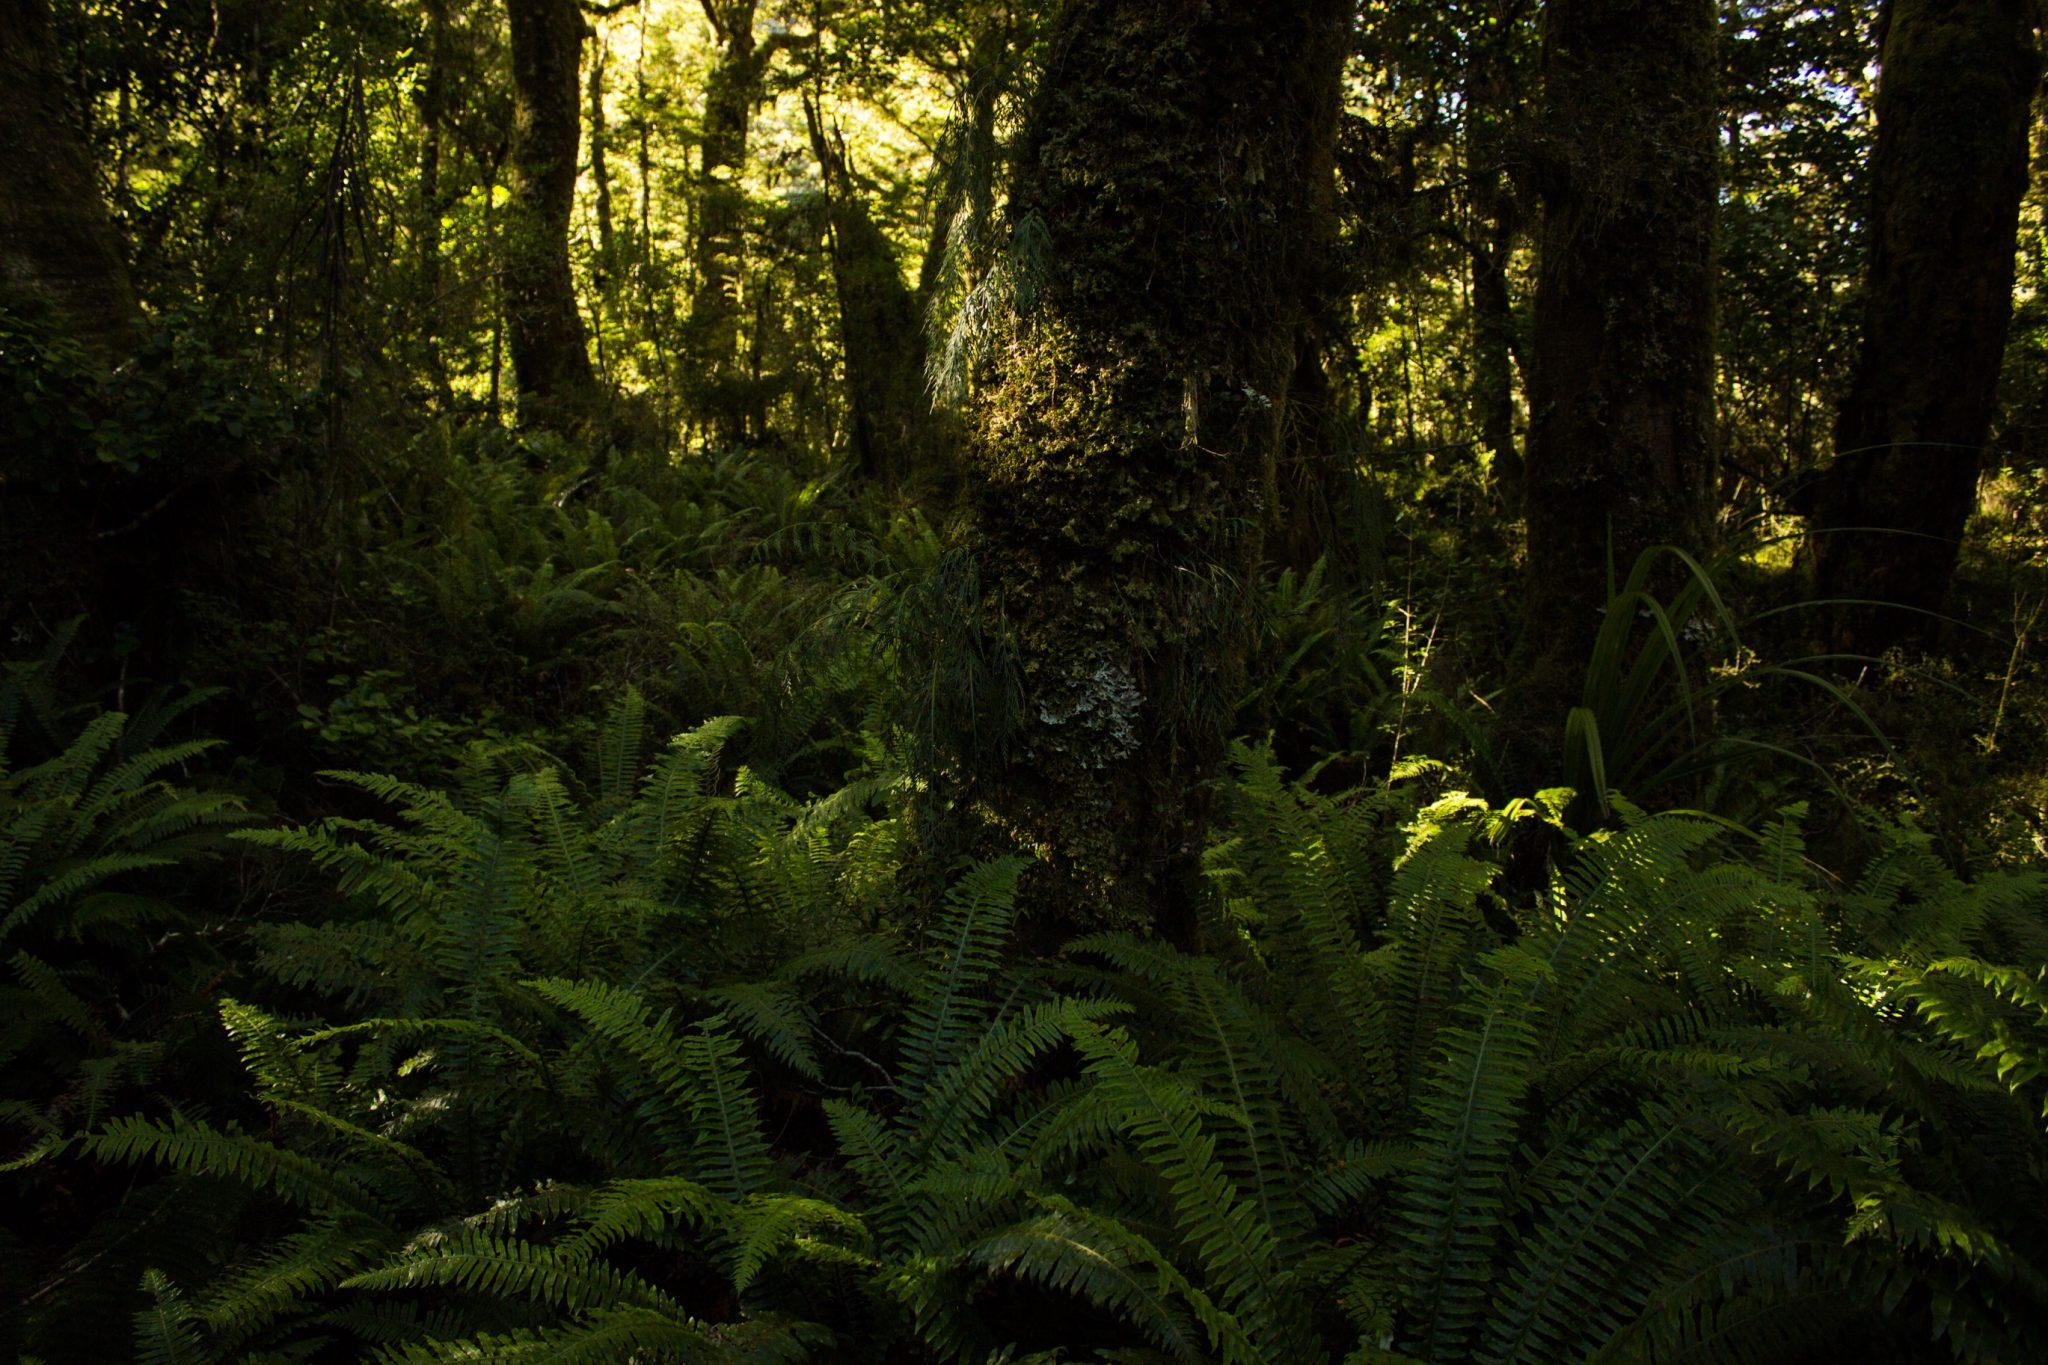 Lake Marian Track wandern, bei Marian Falls im Fiordland National Park Südinsel Neuseelands, dichter saftig grüner Wald, Farne, Wanderung zum See Marian